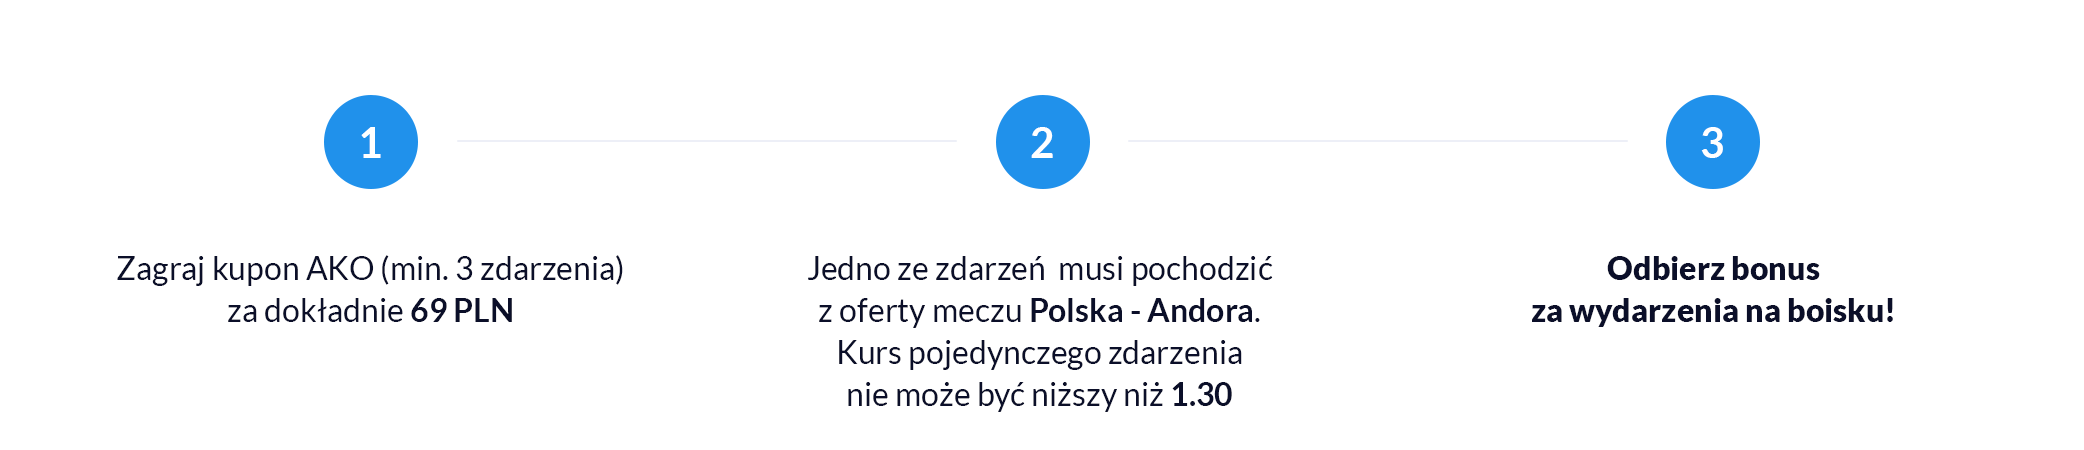 Polska_Andora_3punkty_desktop.png